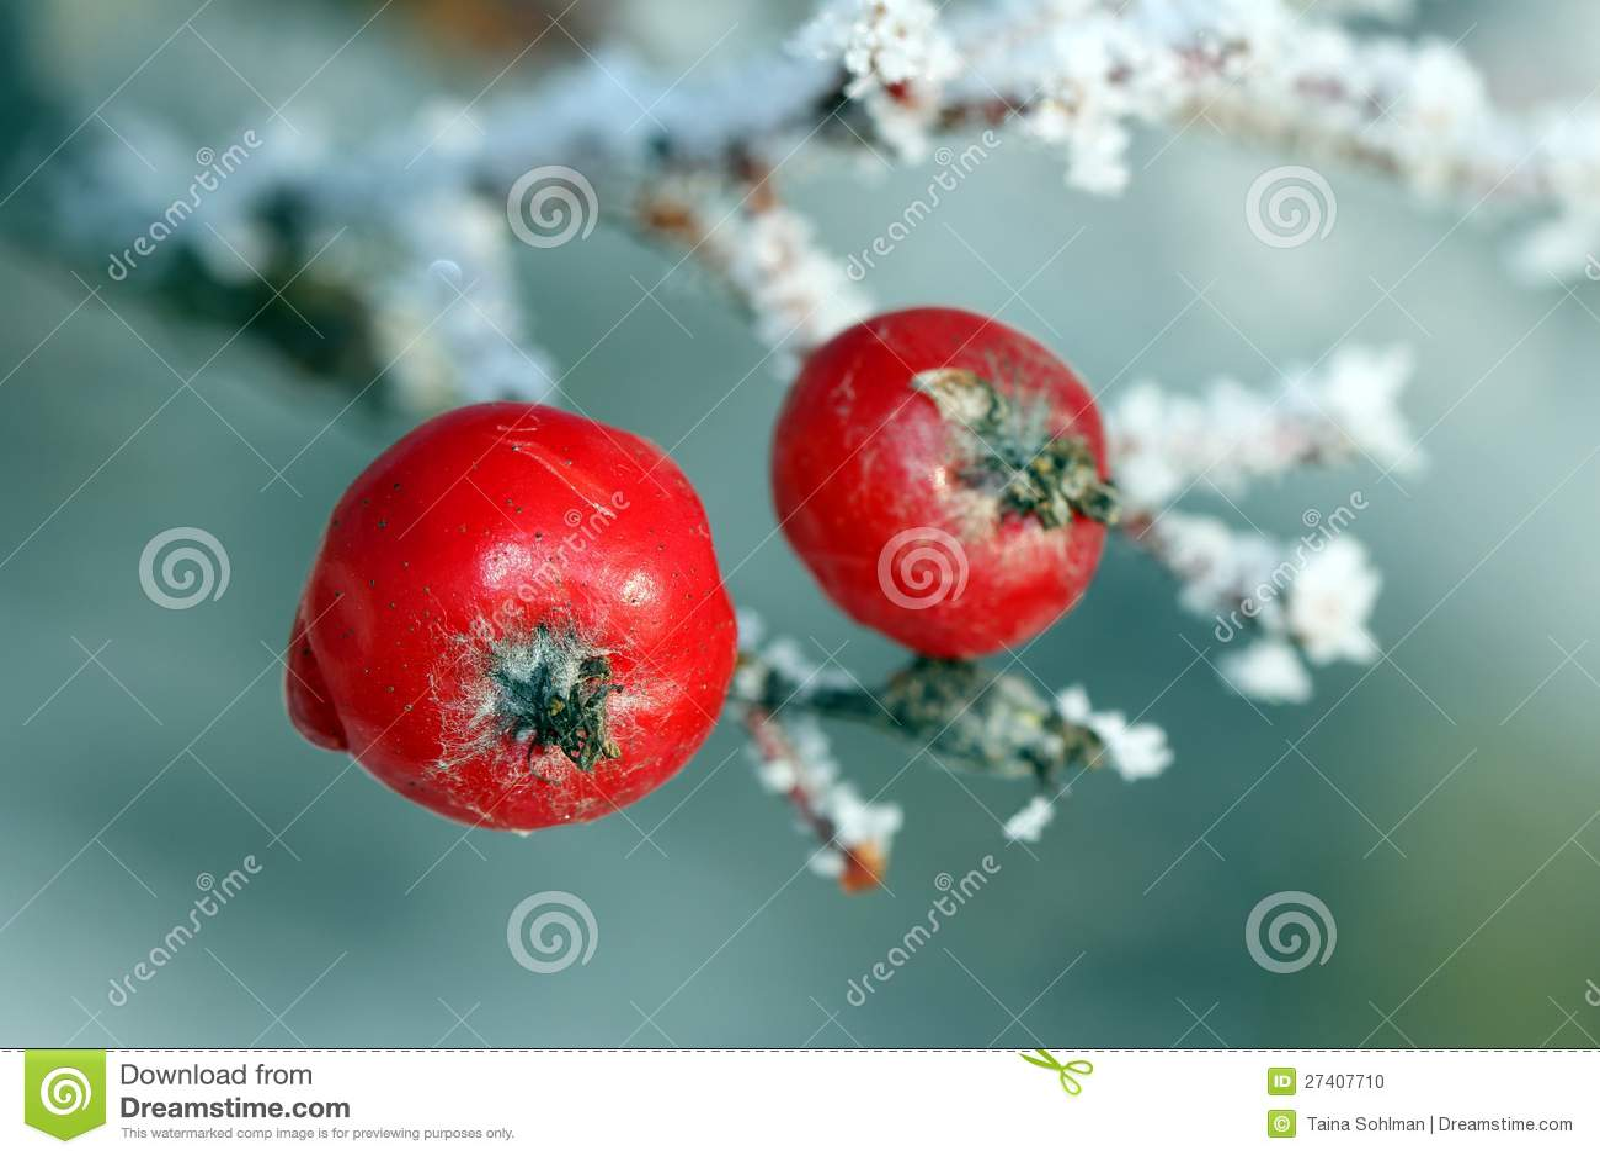 rote eberesche baum beeren abgedeckt mit frost stockfoto bild 27407710. Black Bedroom Furniture Sets. Home Design Ideas